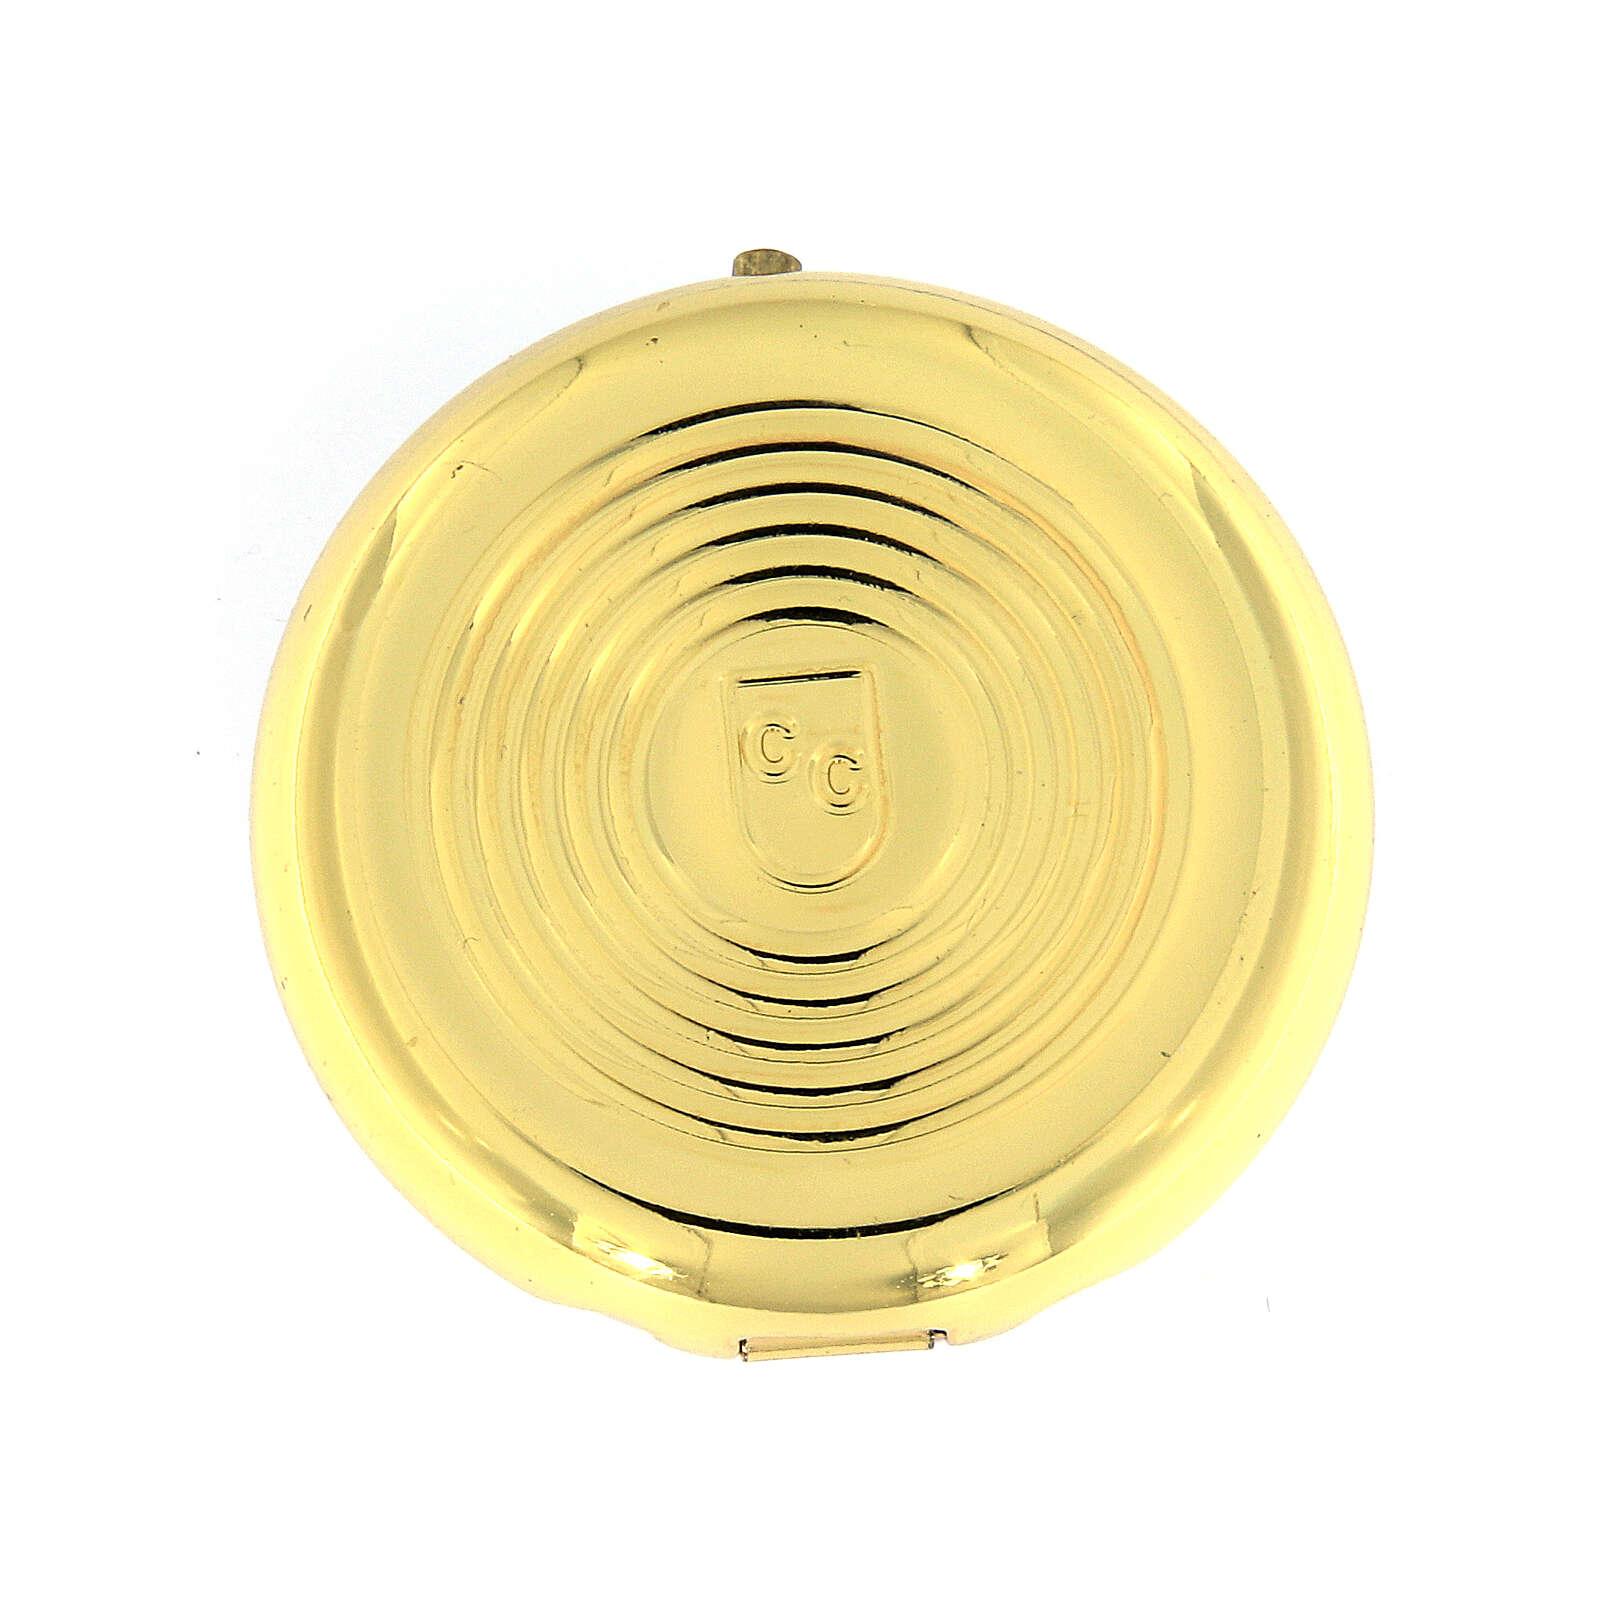 Custode hosties IHS métal plaque aluminium détails or 5 cm 3